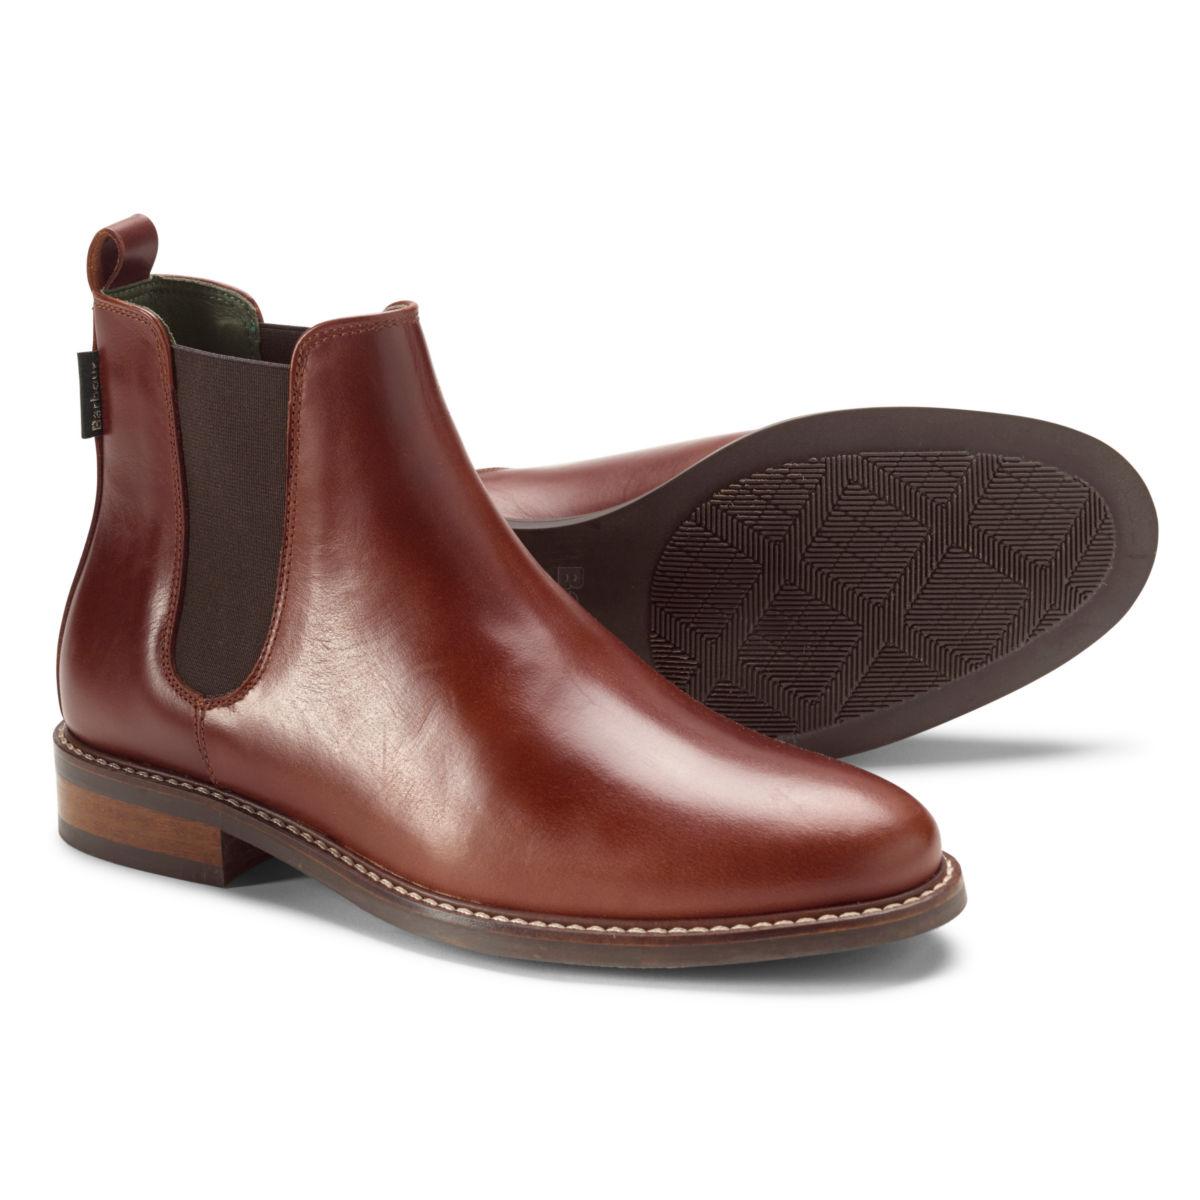 Orvis-Exclusive Barbour® Foxton Chelsea Boots - COGNACimage number 0